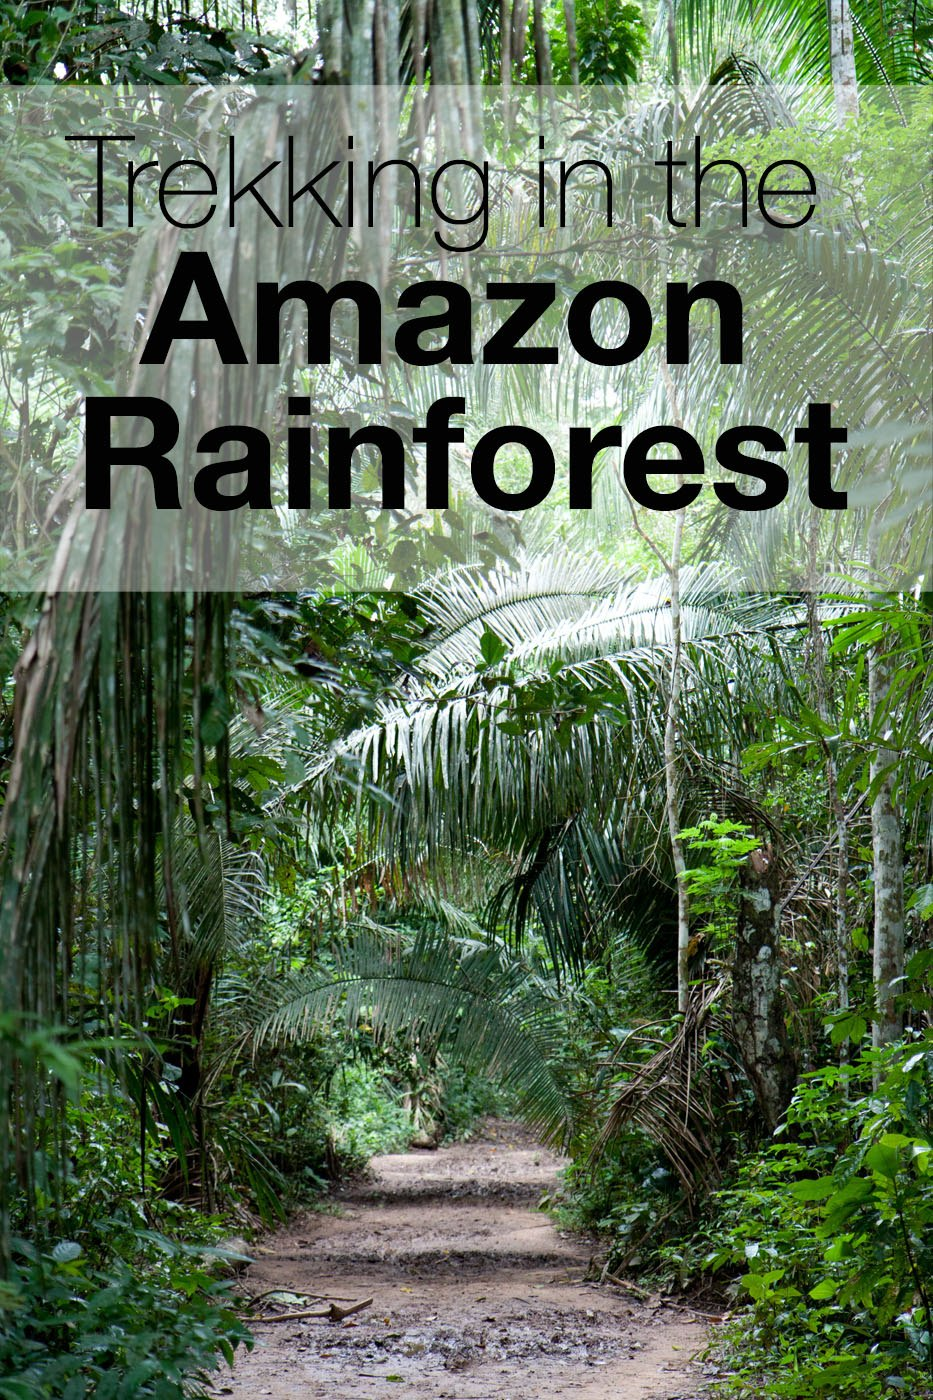 Trekking in the Amazon Rainforest